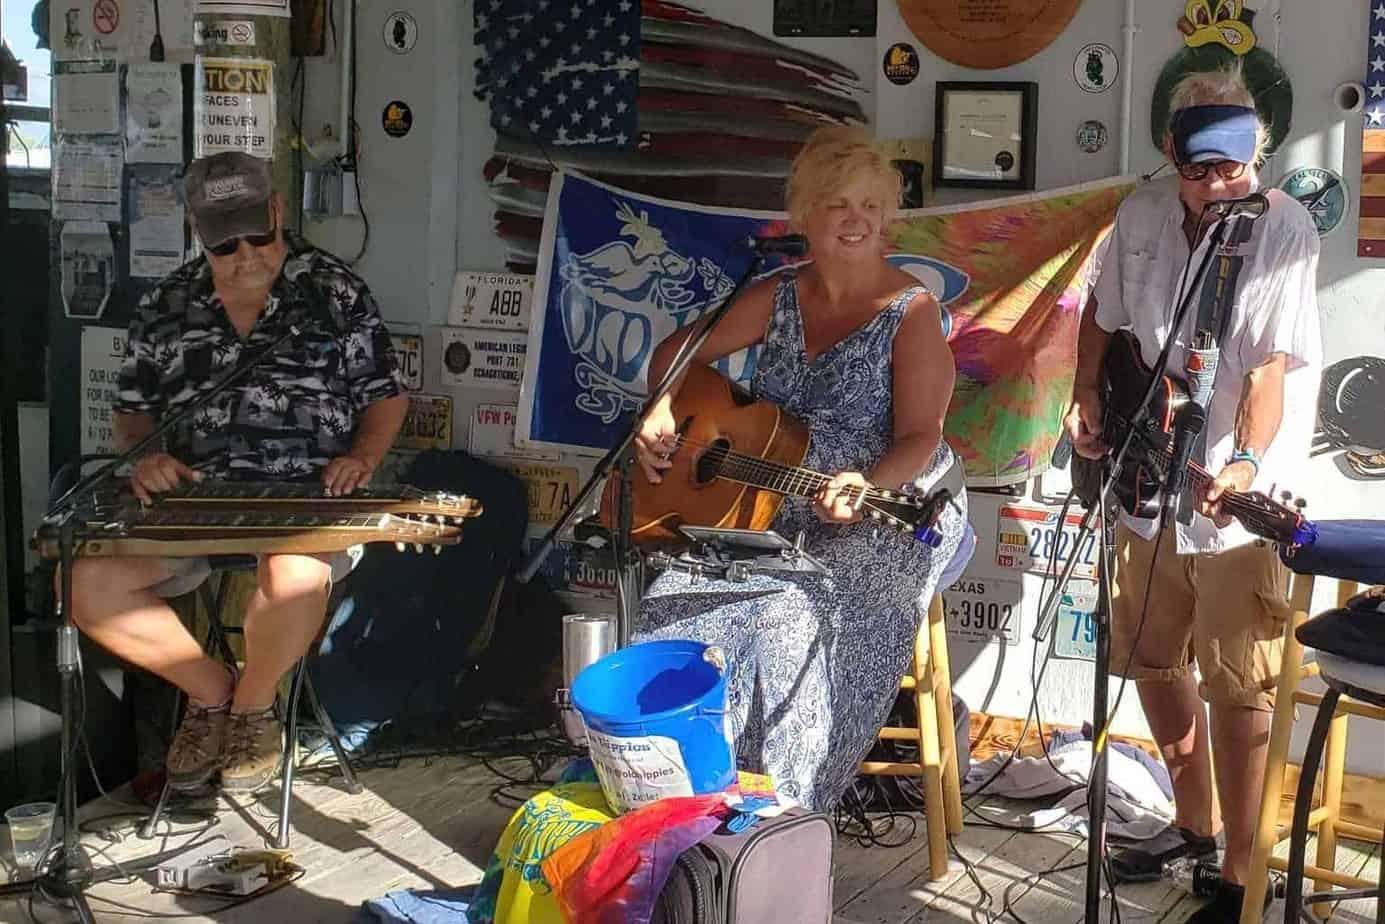 Old Hippies at The Saints Pub